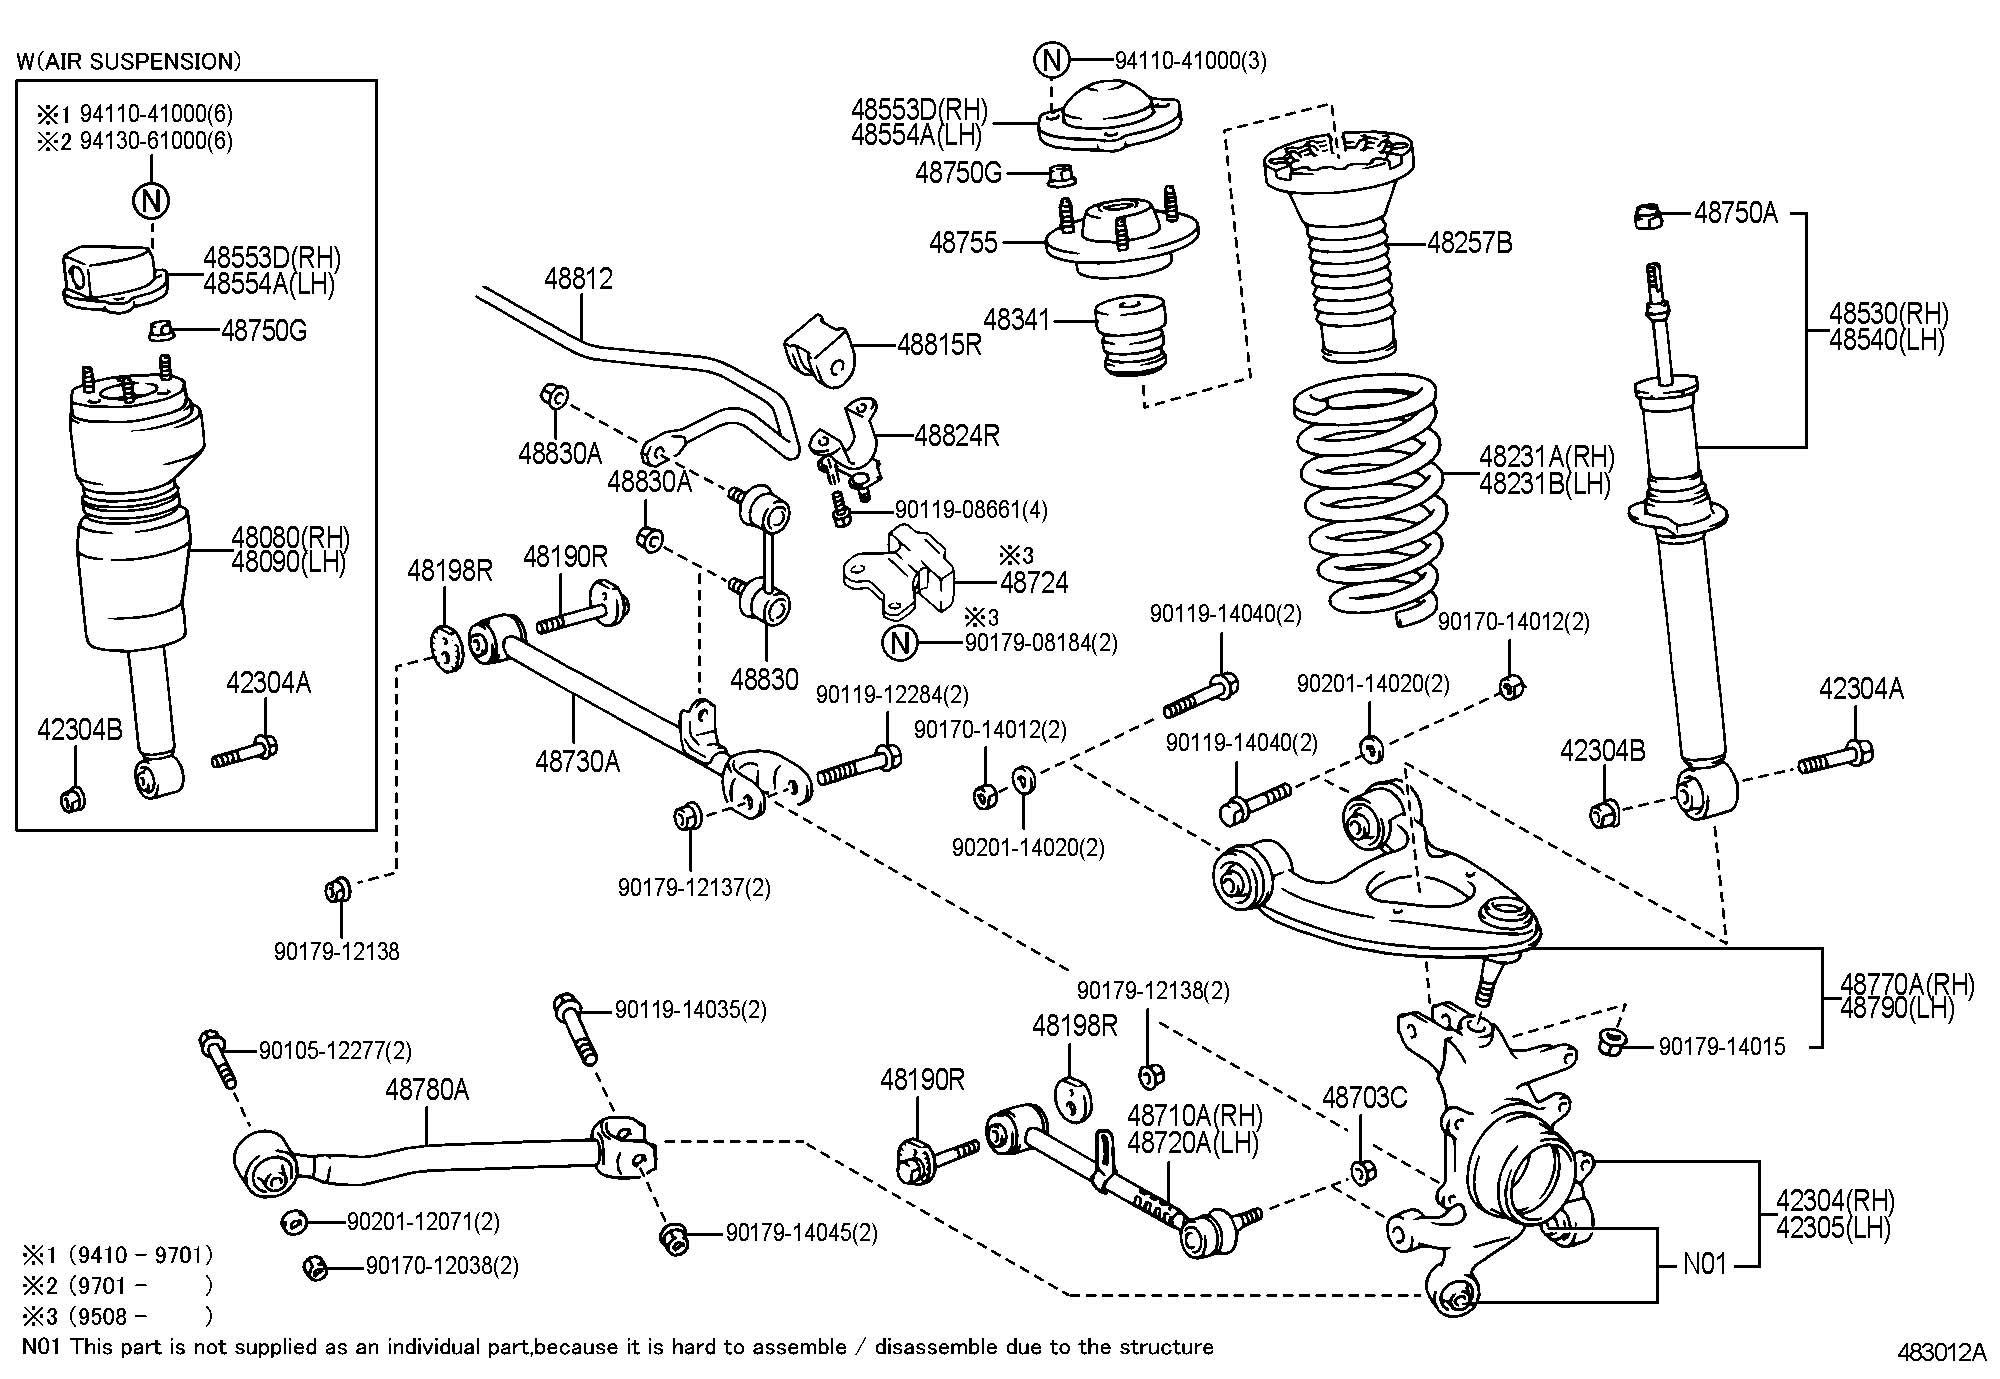 Rear Suspensiom Replacement Ls400 94